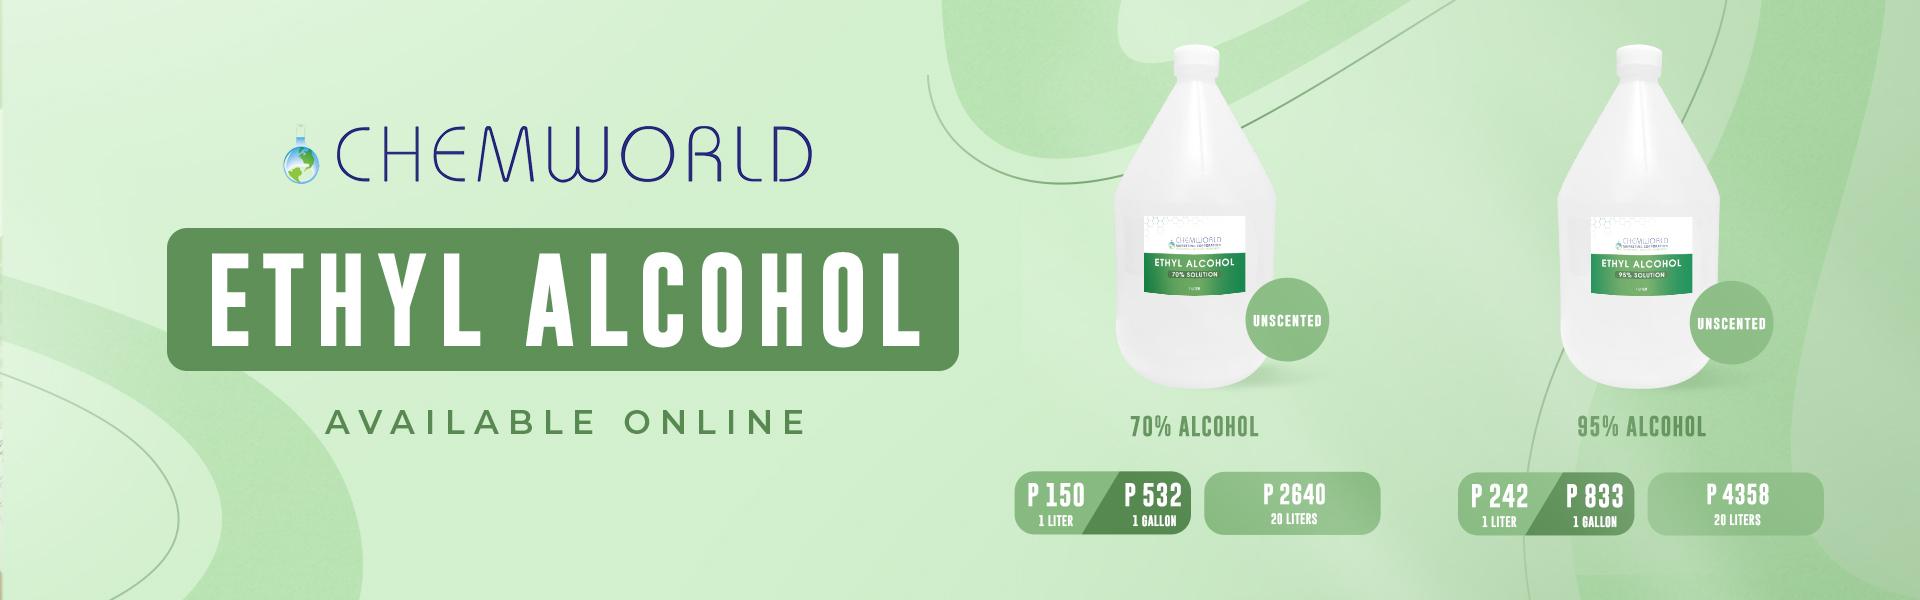 ethyl alcohol banner